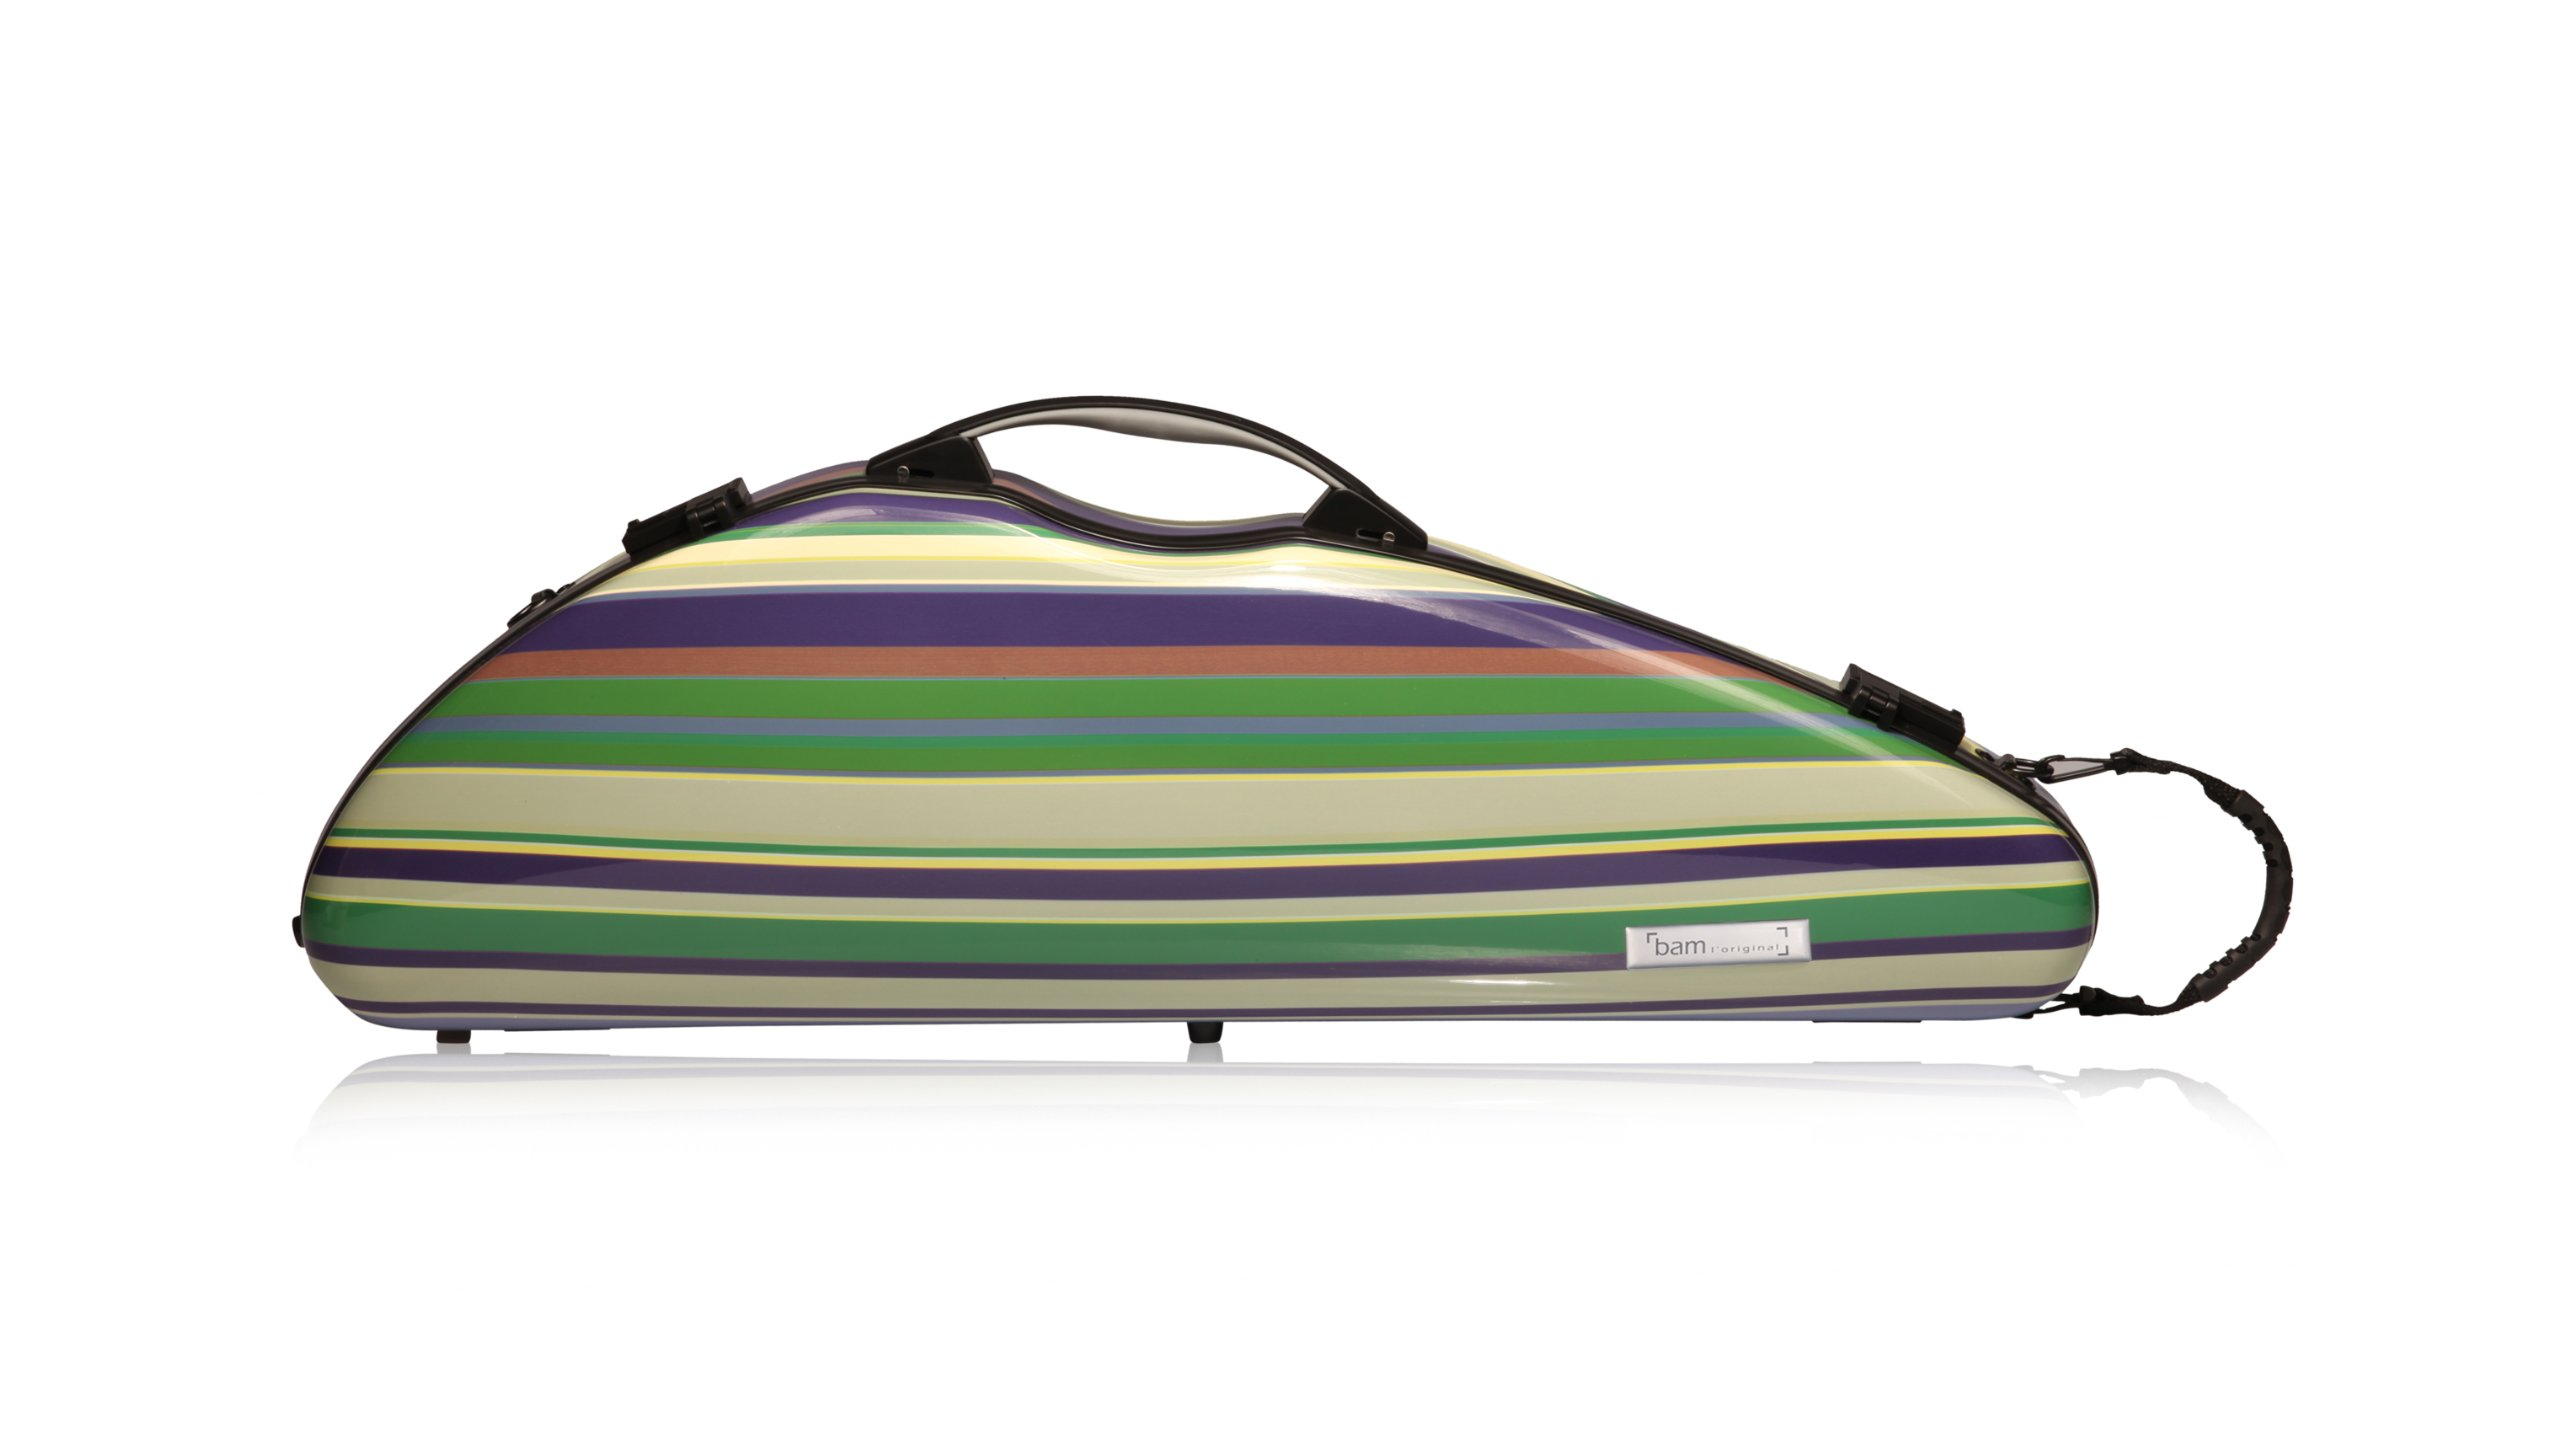 BAM France Hightech Slim 4/4 Violin Case - Limited Edition CL - 2000XL